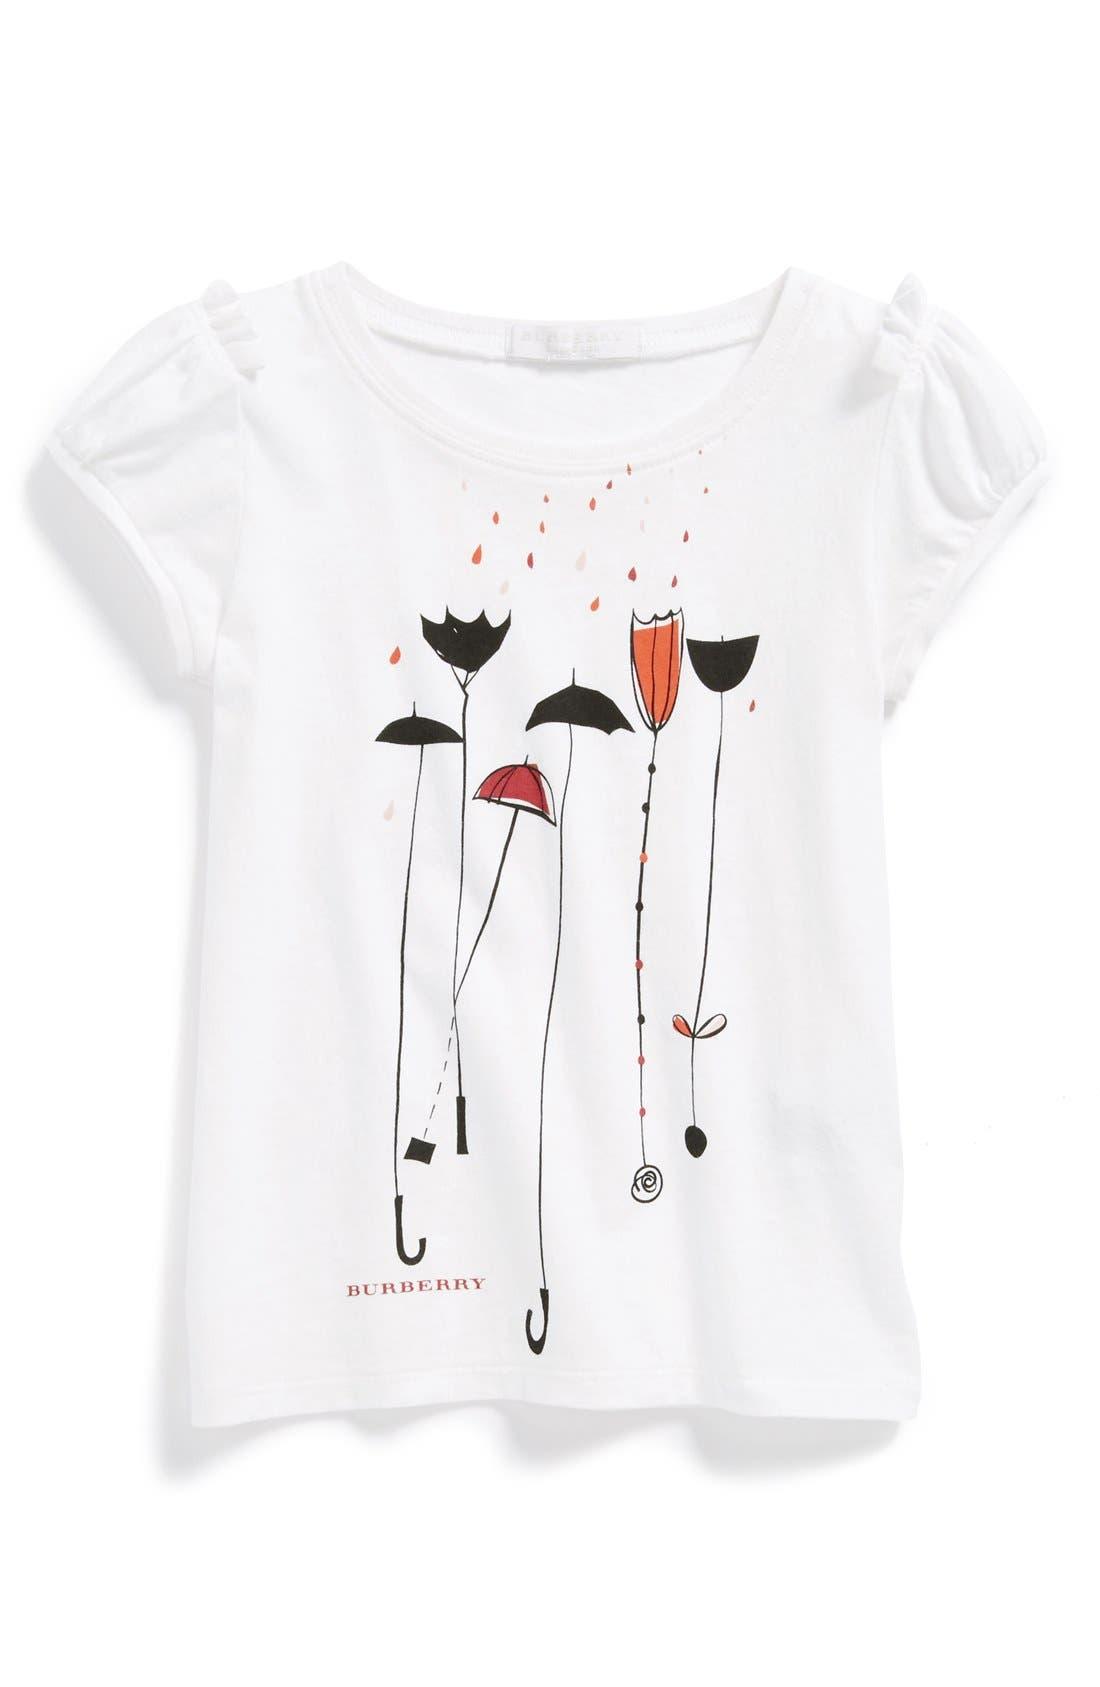 Main Image - Burberry Graphic Tee (Little Girls & Big Girls)